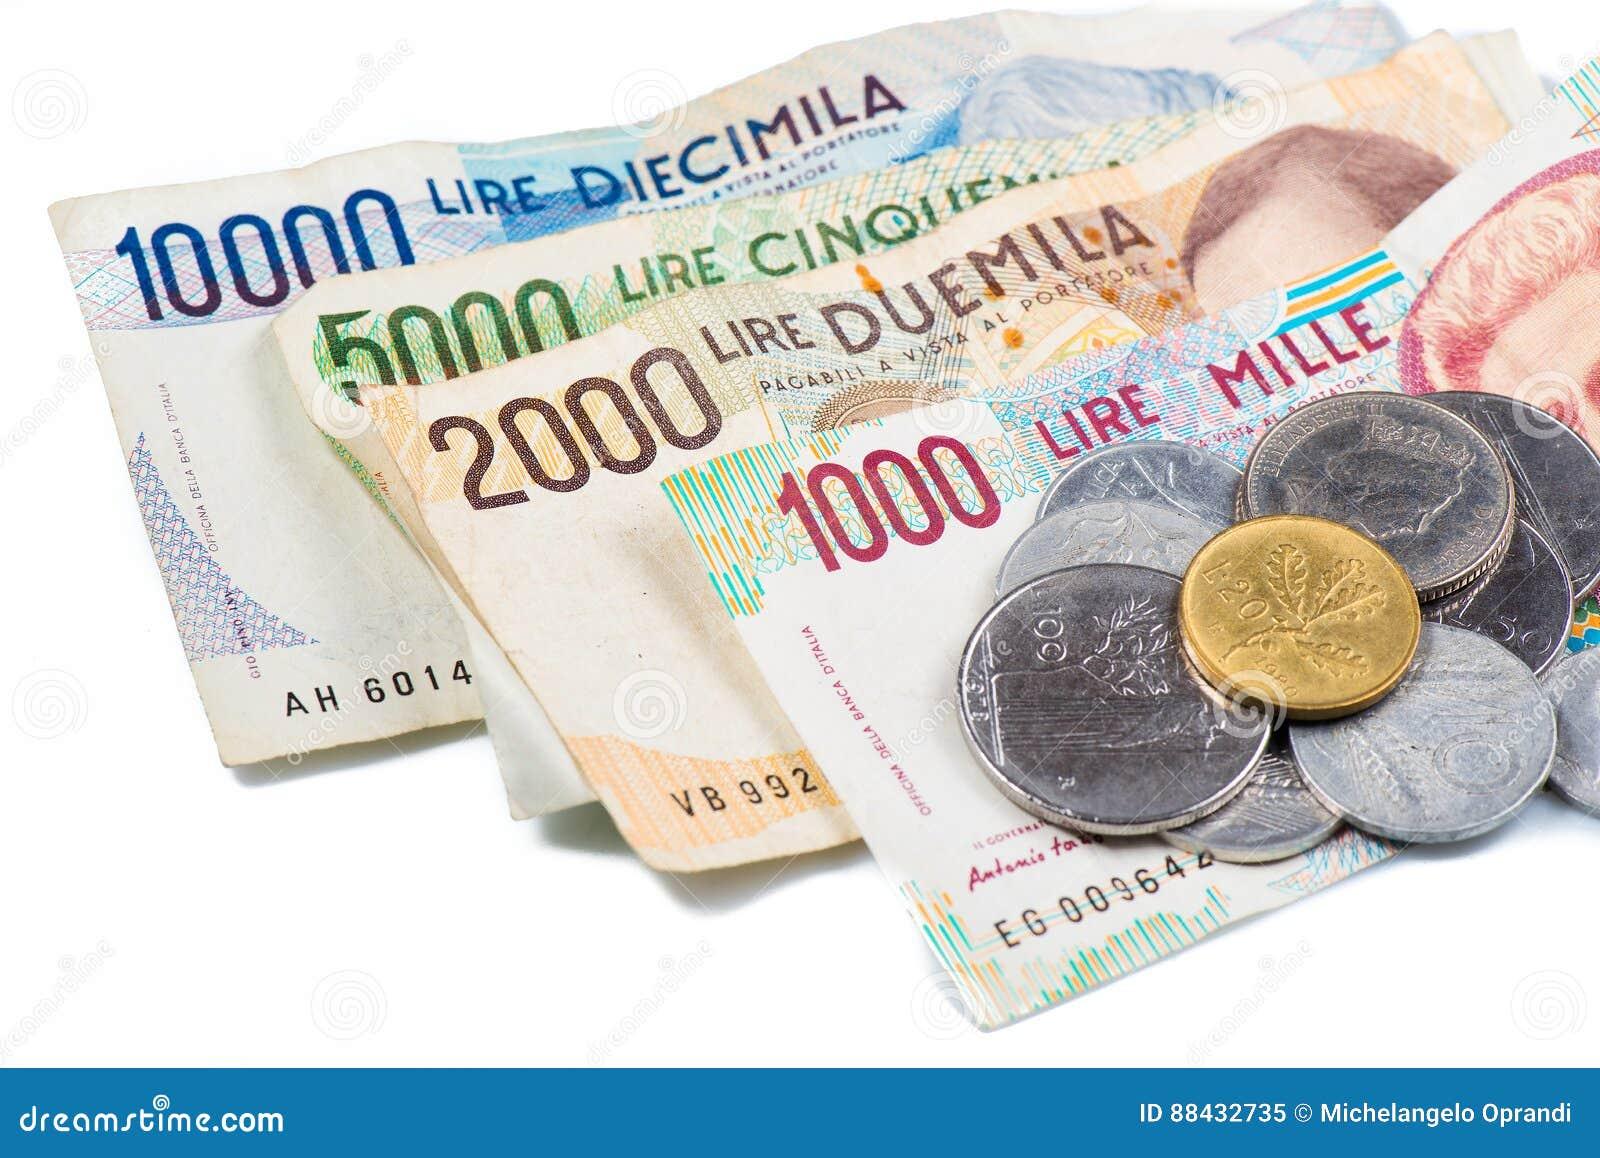 how to say money in italian